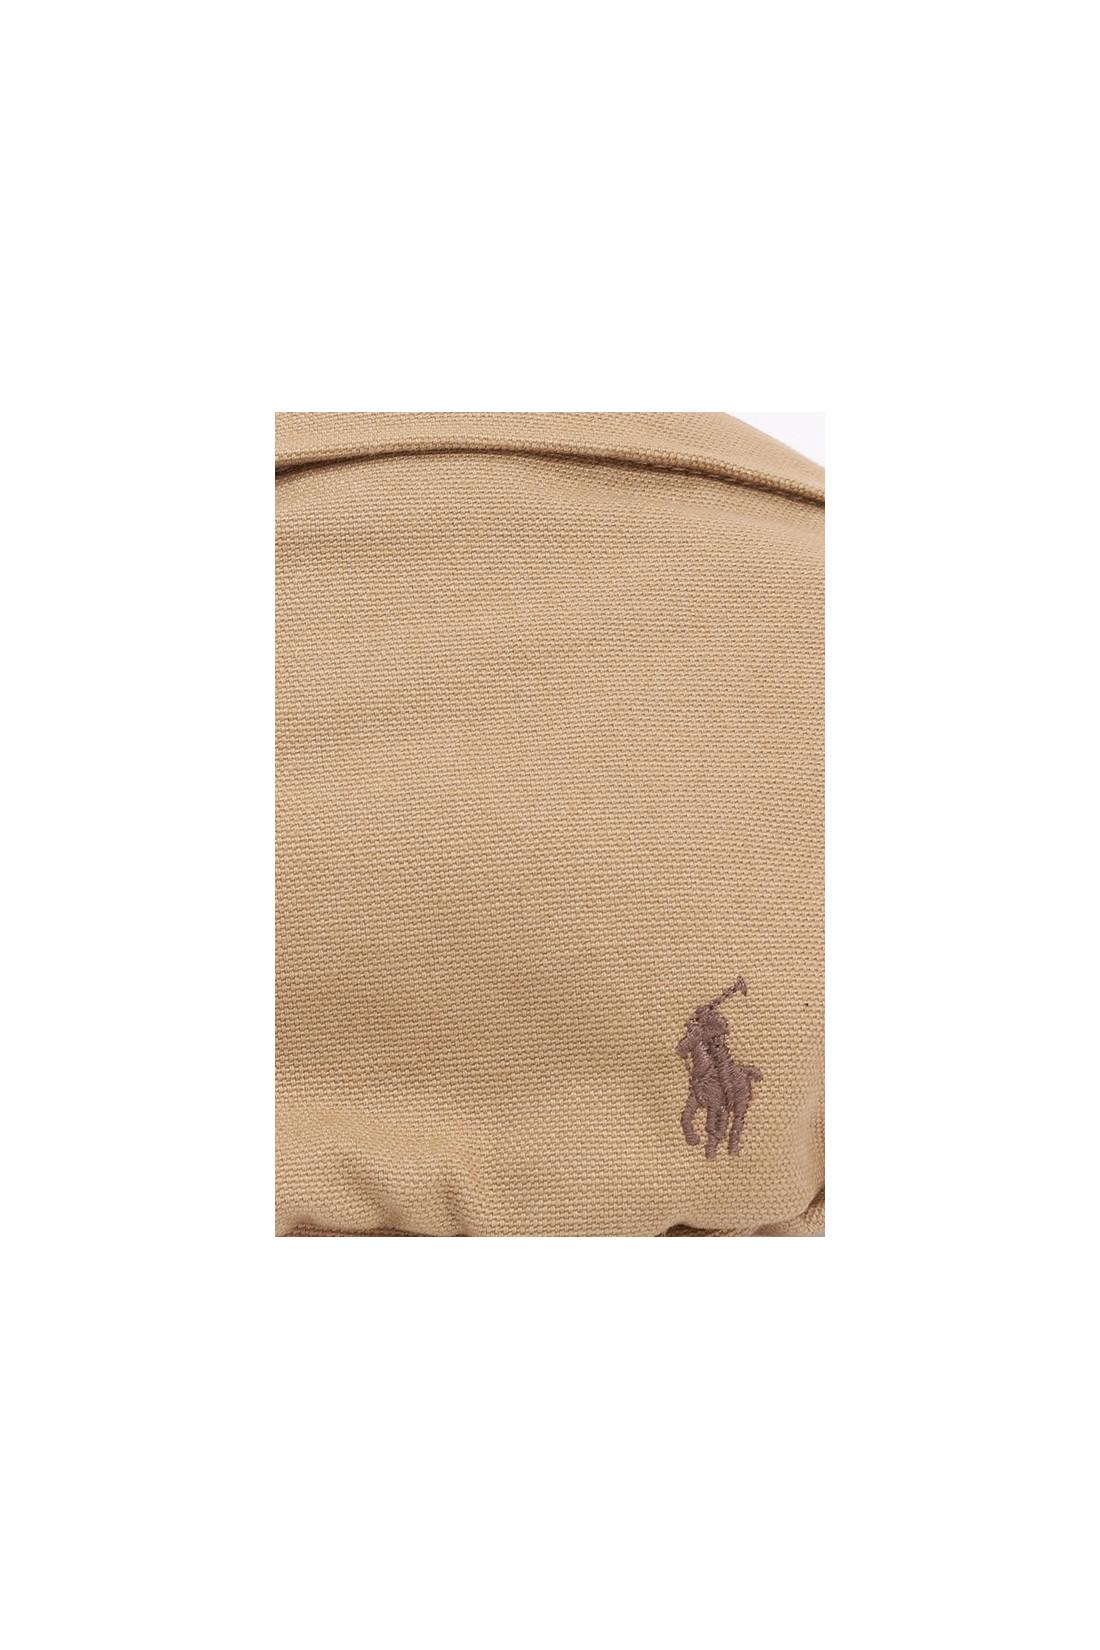 POLO RALPH LAUREN / Waistbag canvas Tan